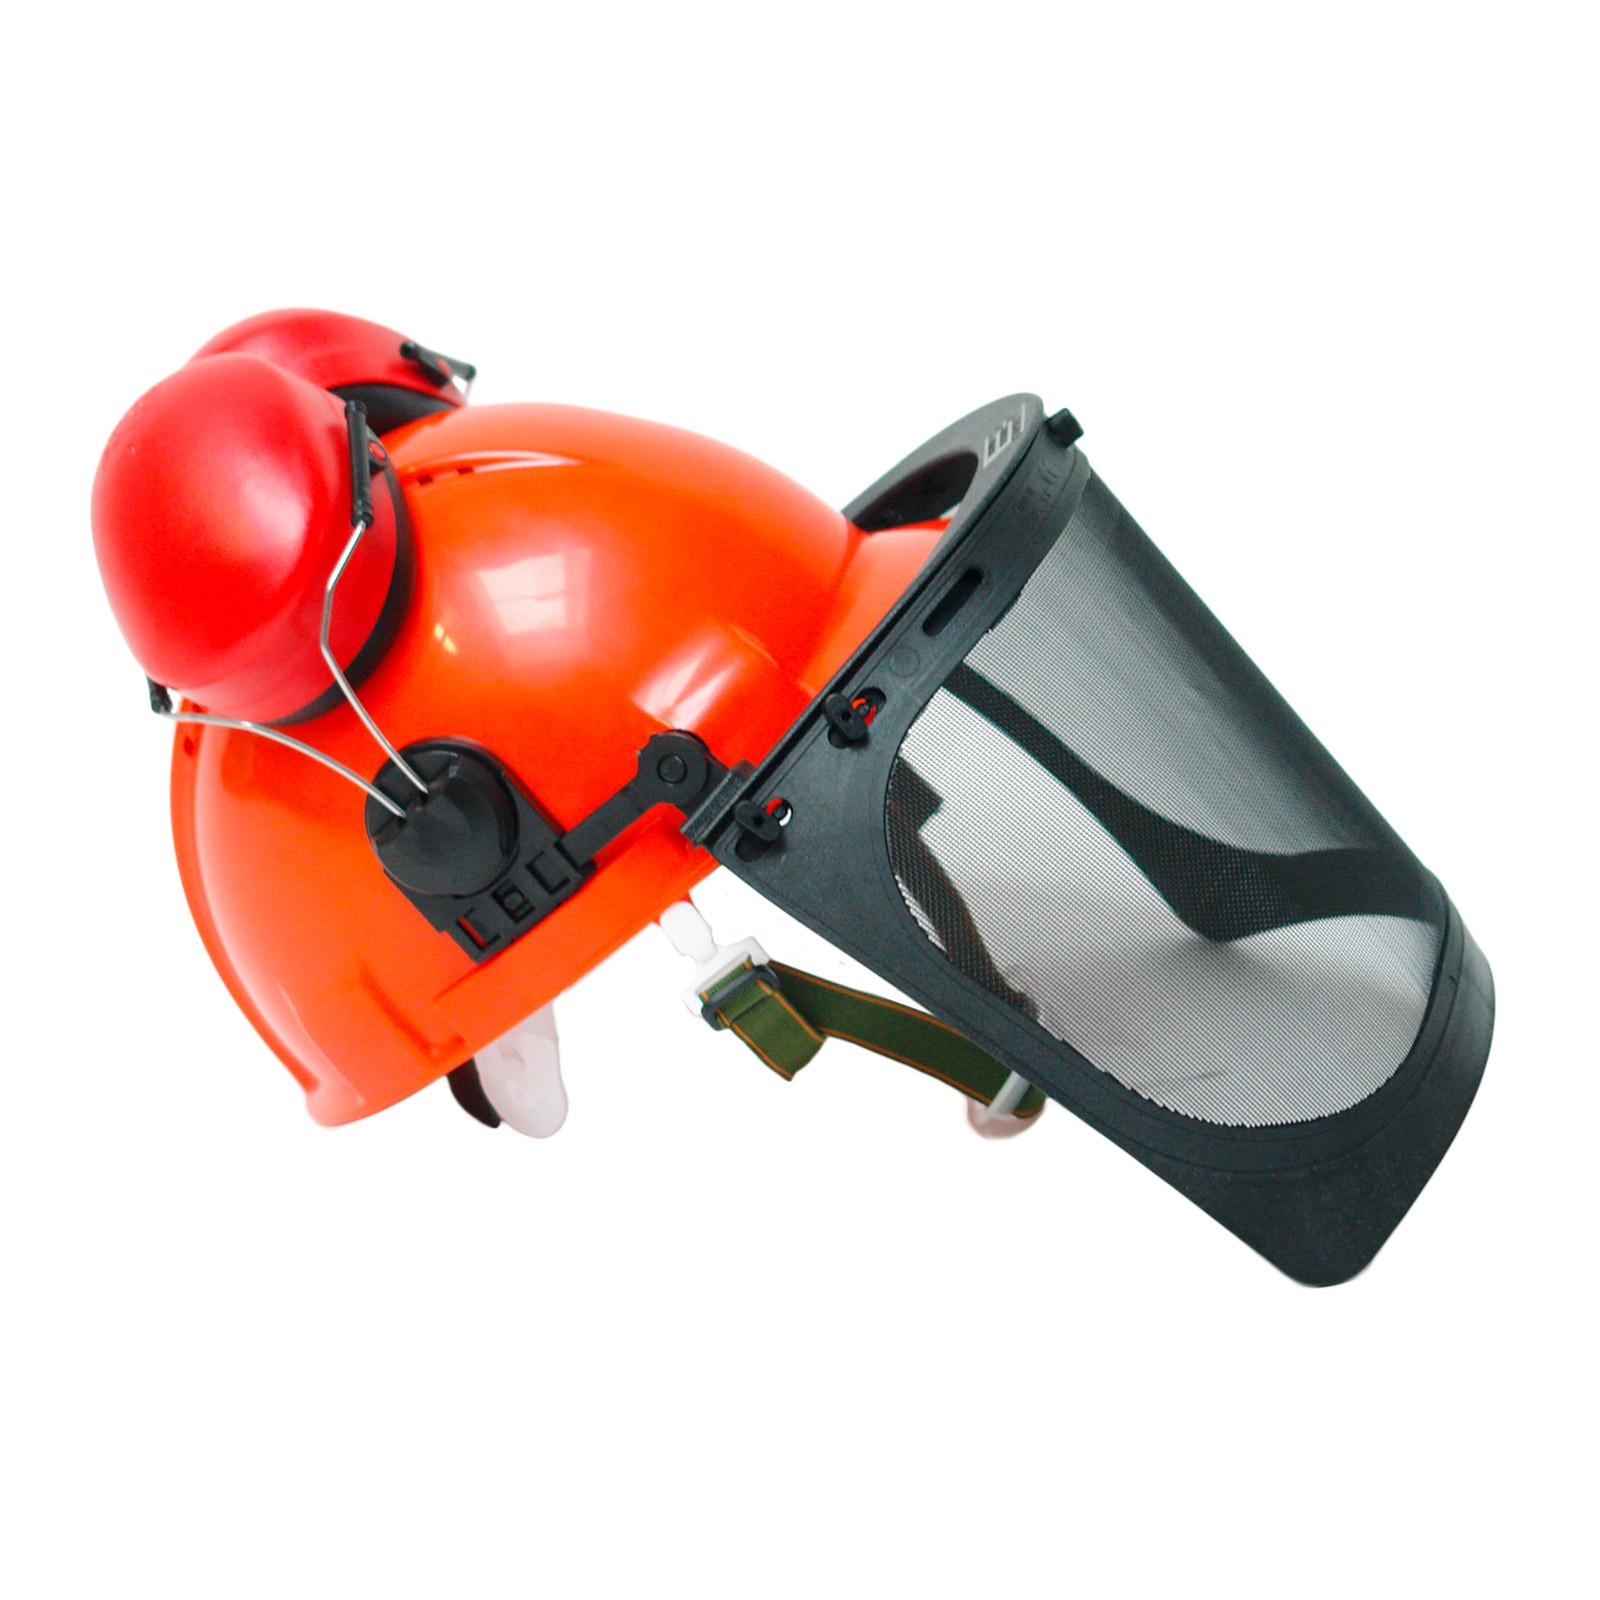 Forsthelm / Forstschutzhelm 54-63 cm orange normgerecht PSA-Forst Kopfschutz, Forsthelm-Kombination, PSA-Forst, Schutzhelm Waldarbeit, Sägehelm, Forstarbeitshelm, Waldarbeiterhelm, 4031765302234, 914454